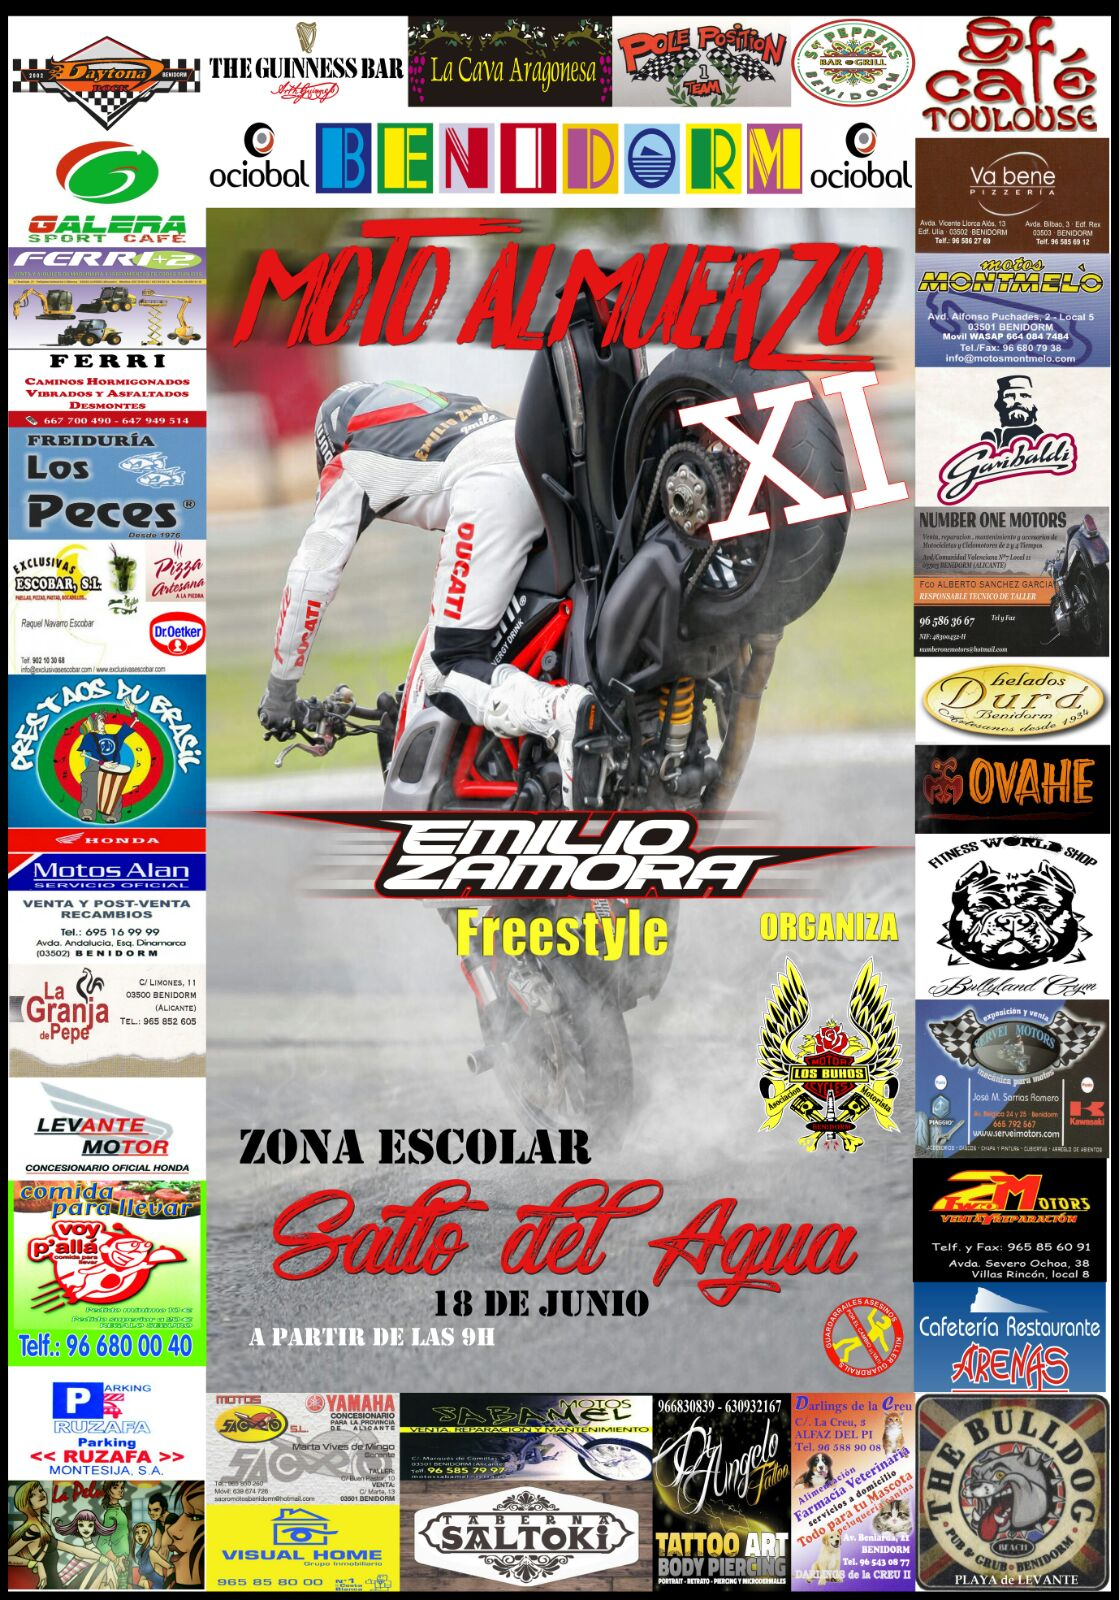 MOTOALMUERZO_BENIDORM_LOS BUHOS_XI ANIVERSARIO_EMILIO_ZAMORA_DUCATI_STUNT_TEAM_MOTOR_SHOW_ESPECTAUCLO_DIAVEL_STOPPIE_WHEELIE_ONFIRE_2017